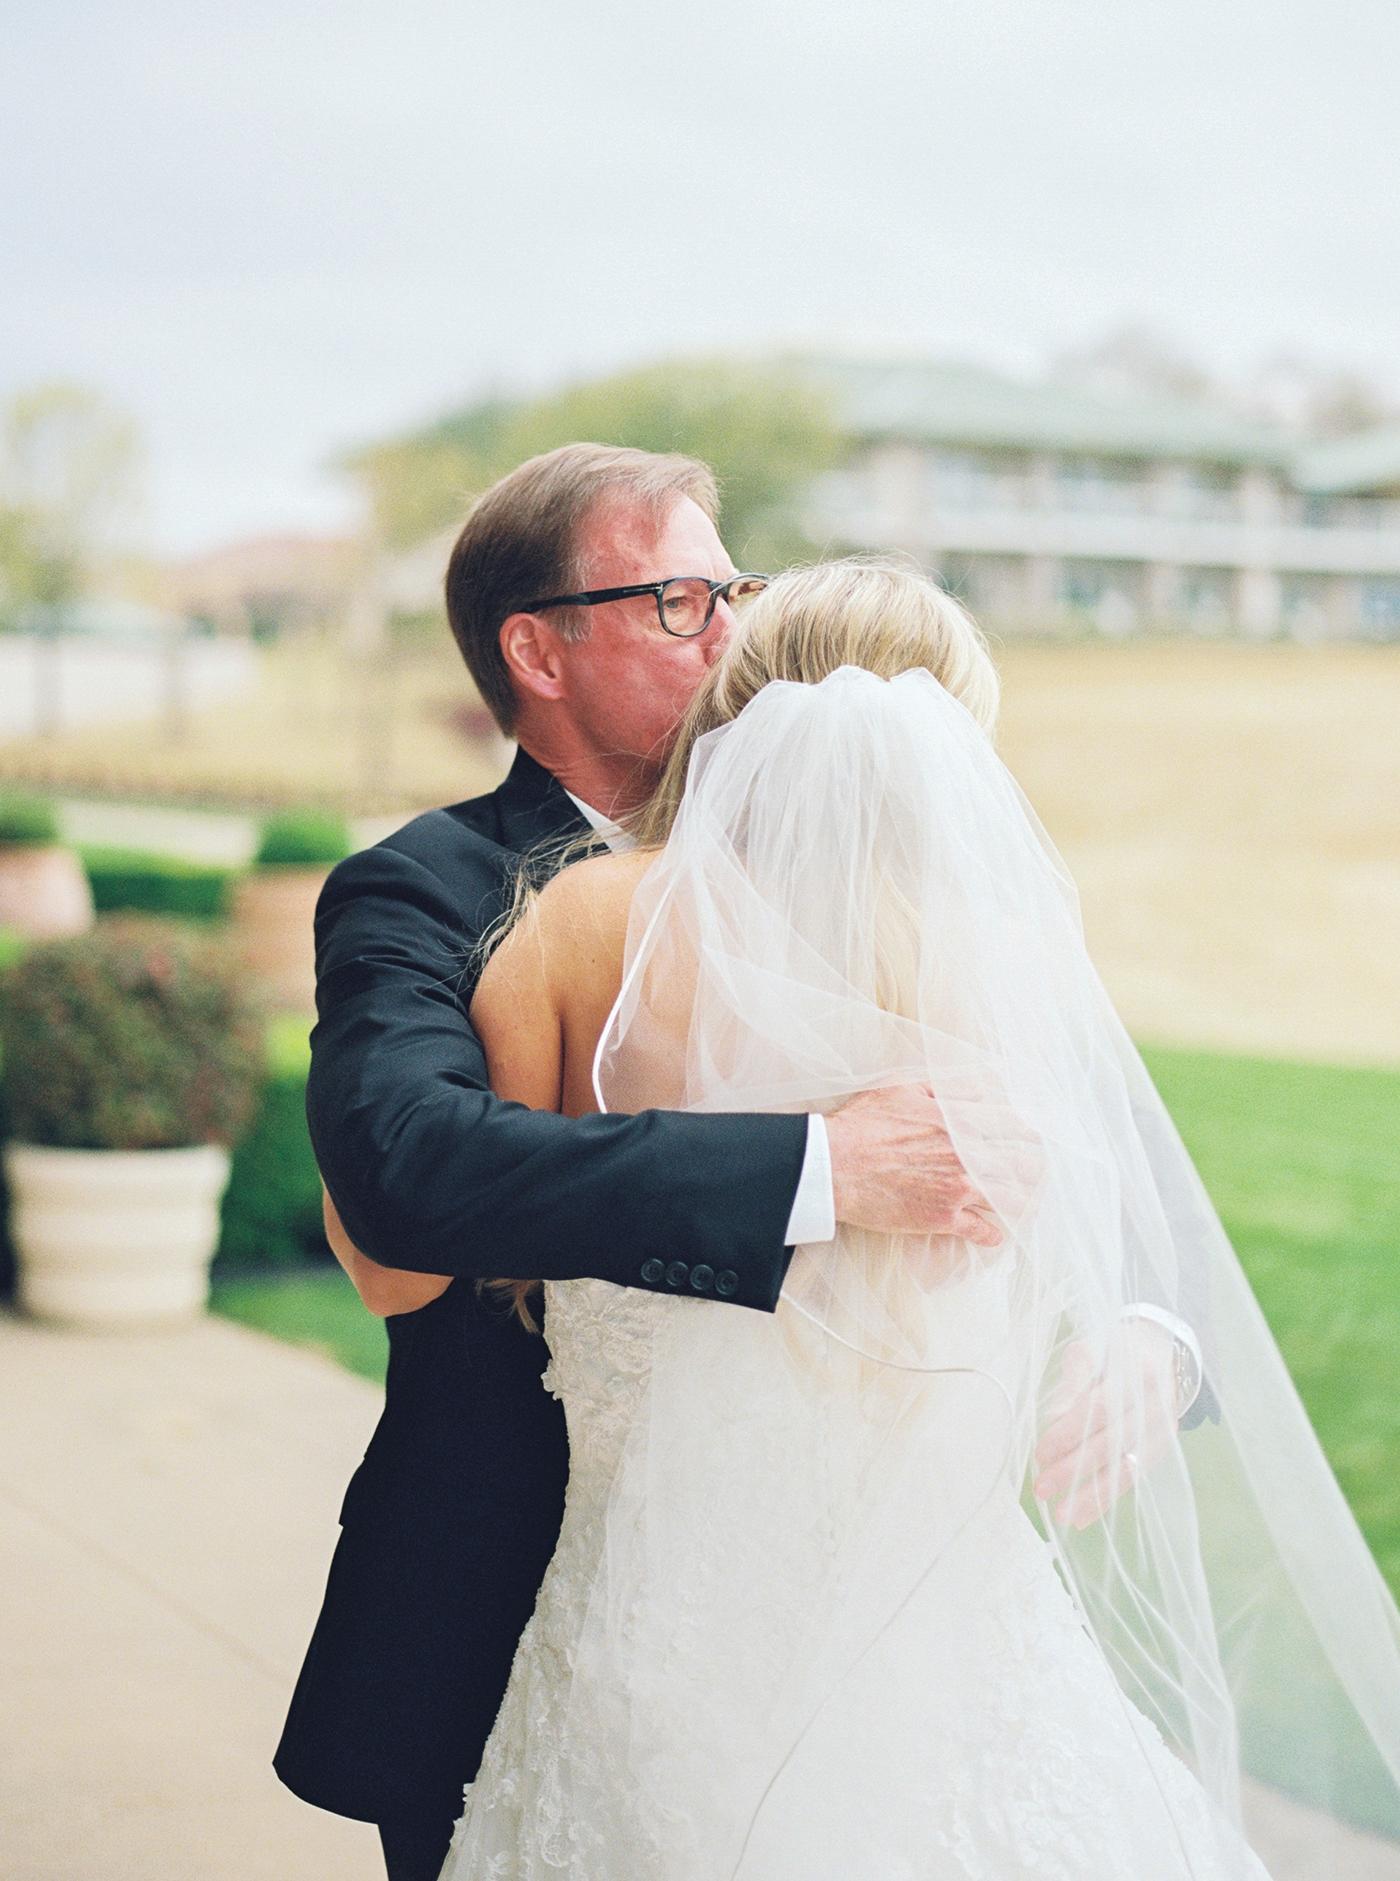 DFW Wedding Planner - Caroline + Jeff at The Four Seasons Hotel Wedding - Allday Events - 37.jpg